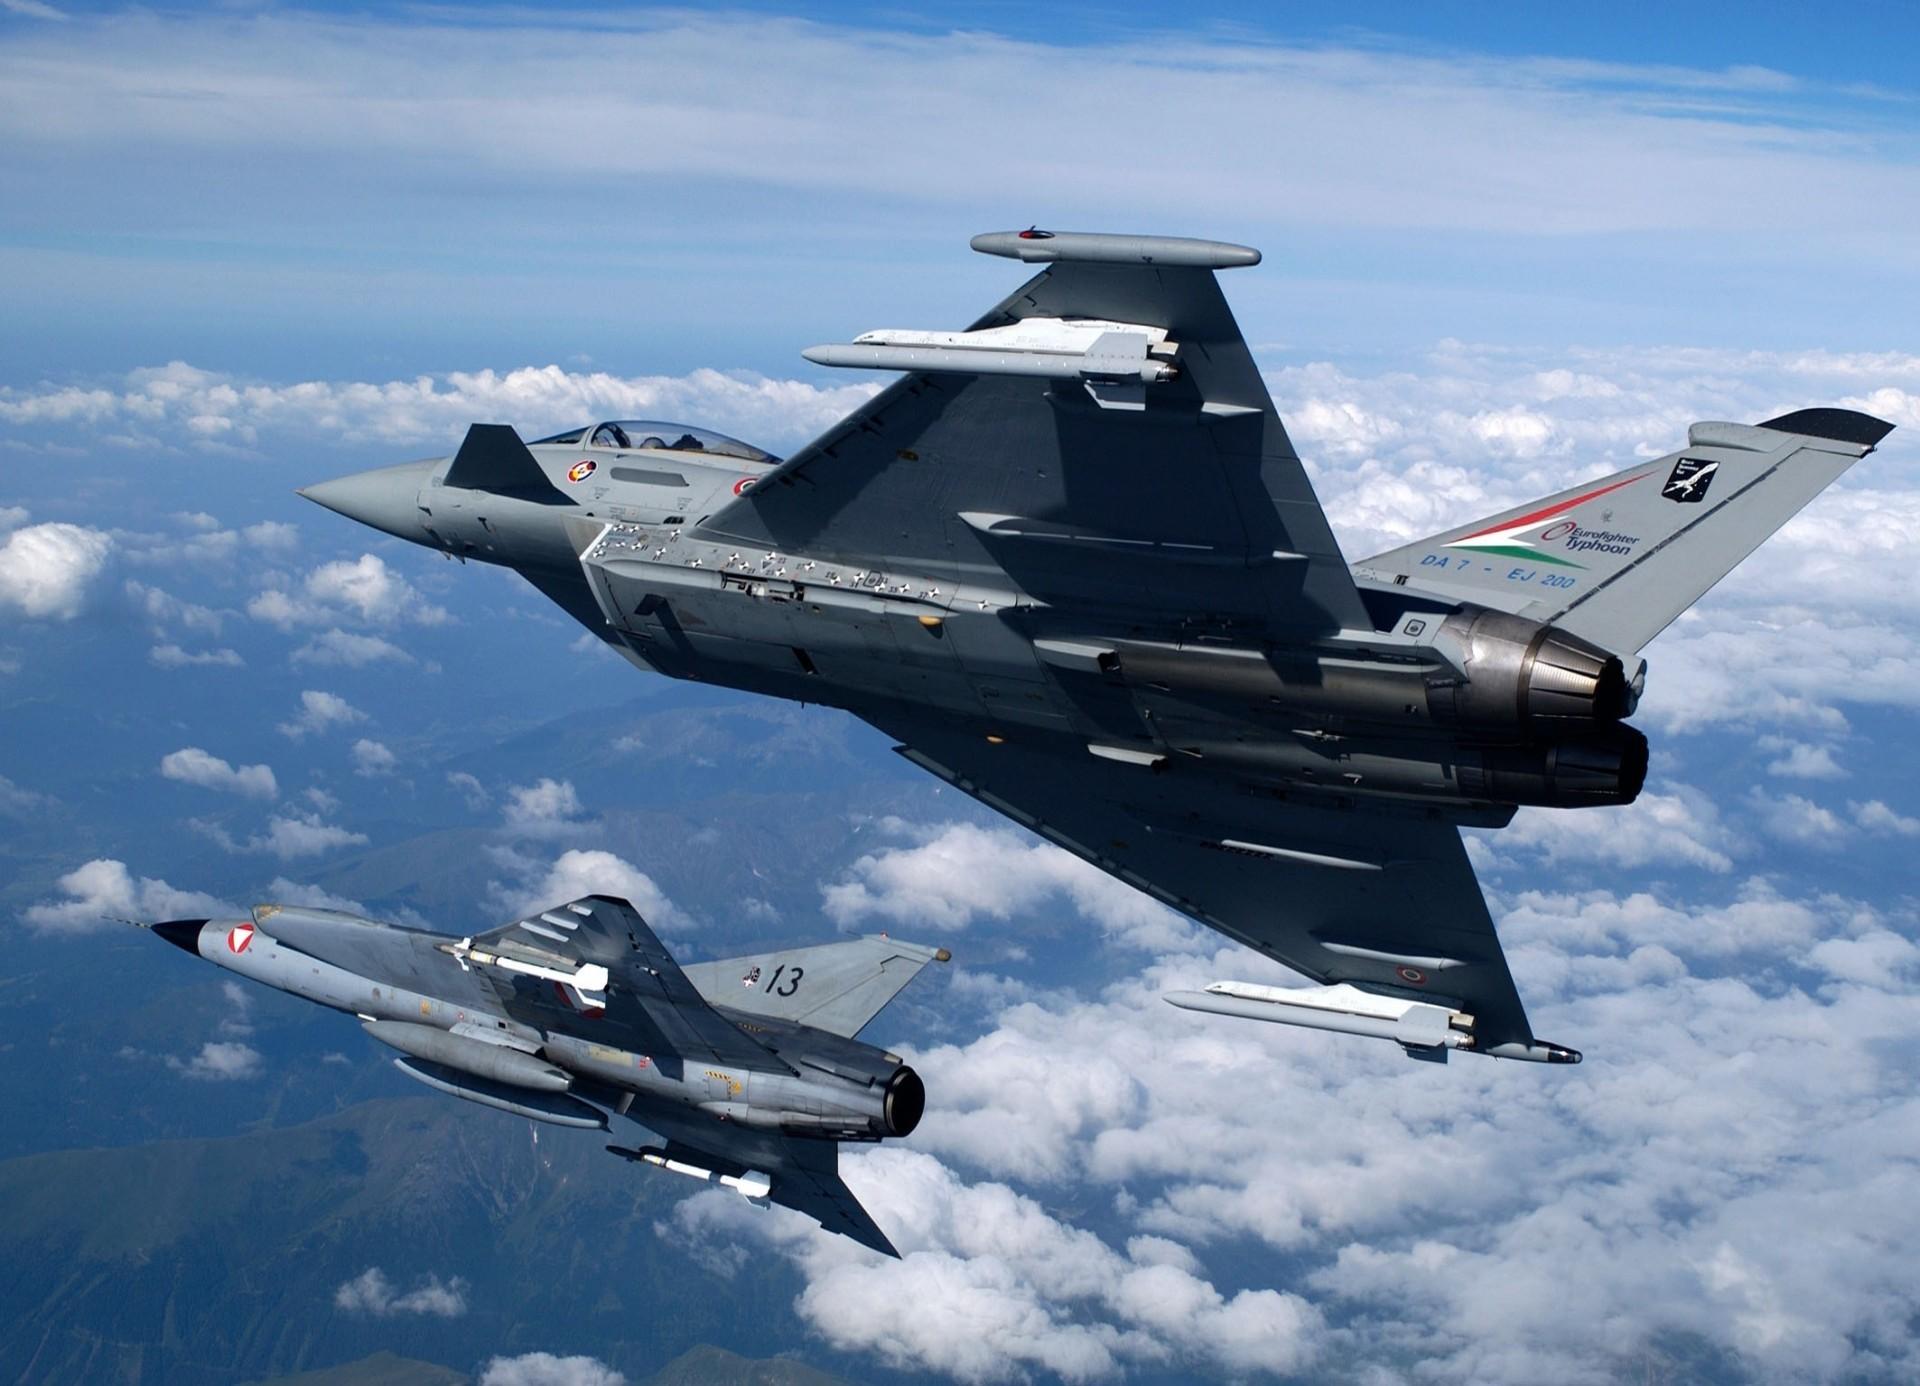 Обои самолеты, Eurofighter typhoon. Авиация foto 15